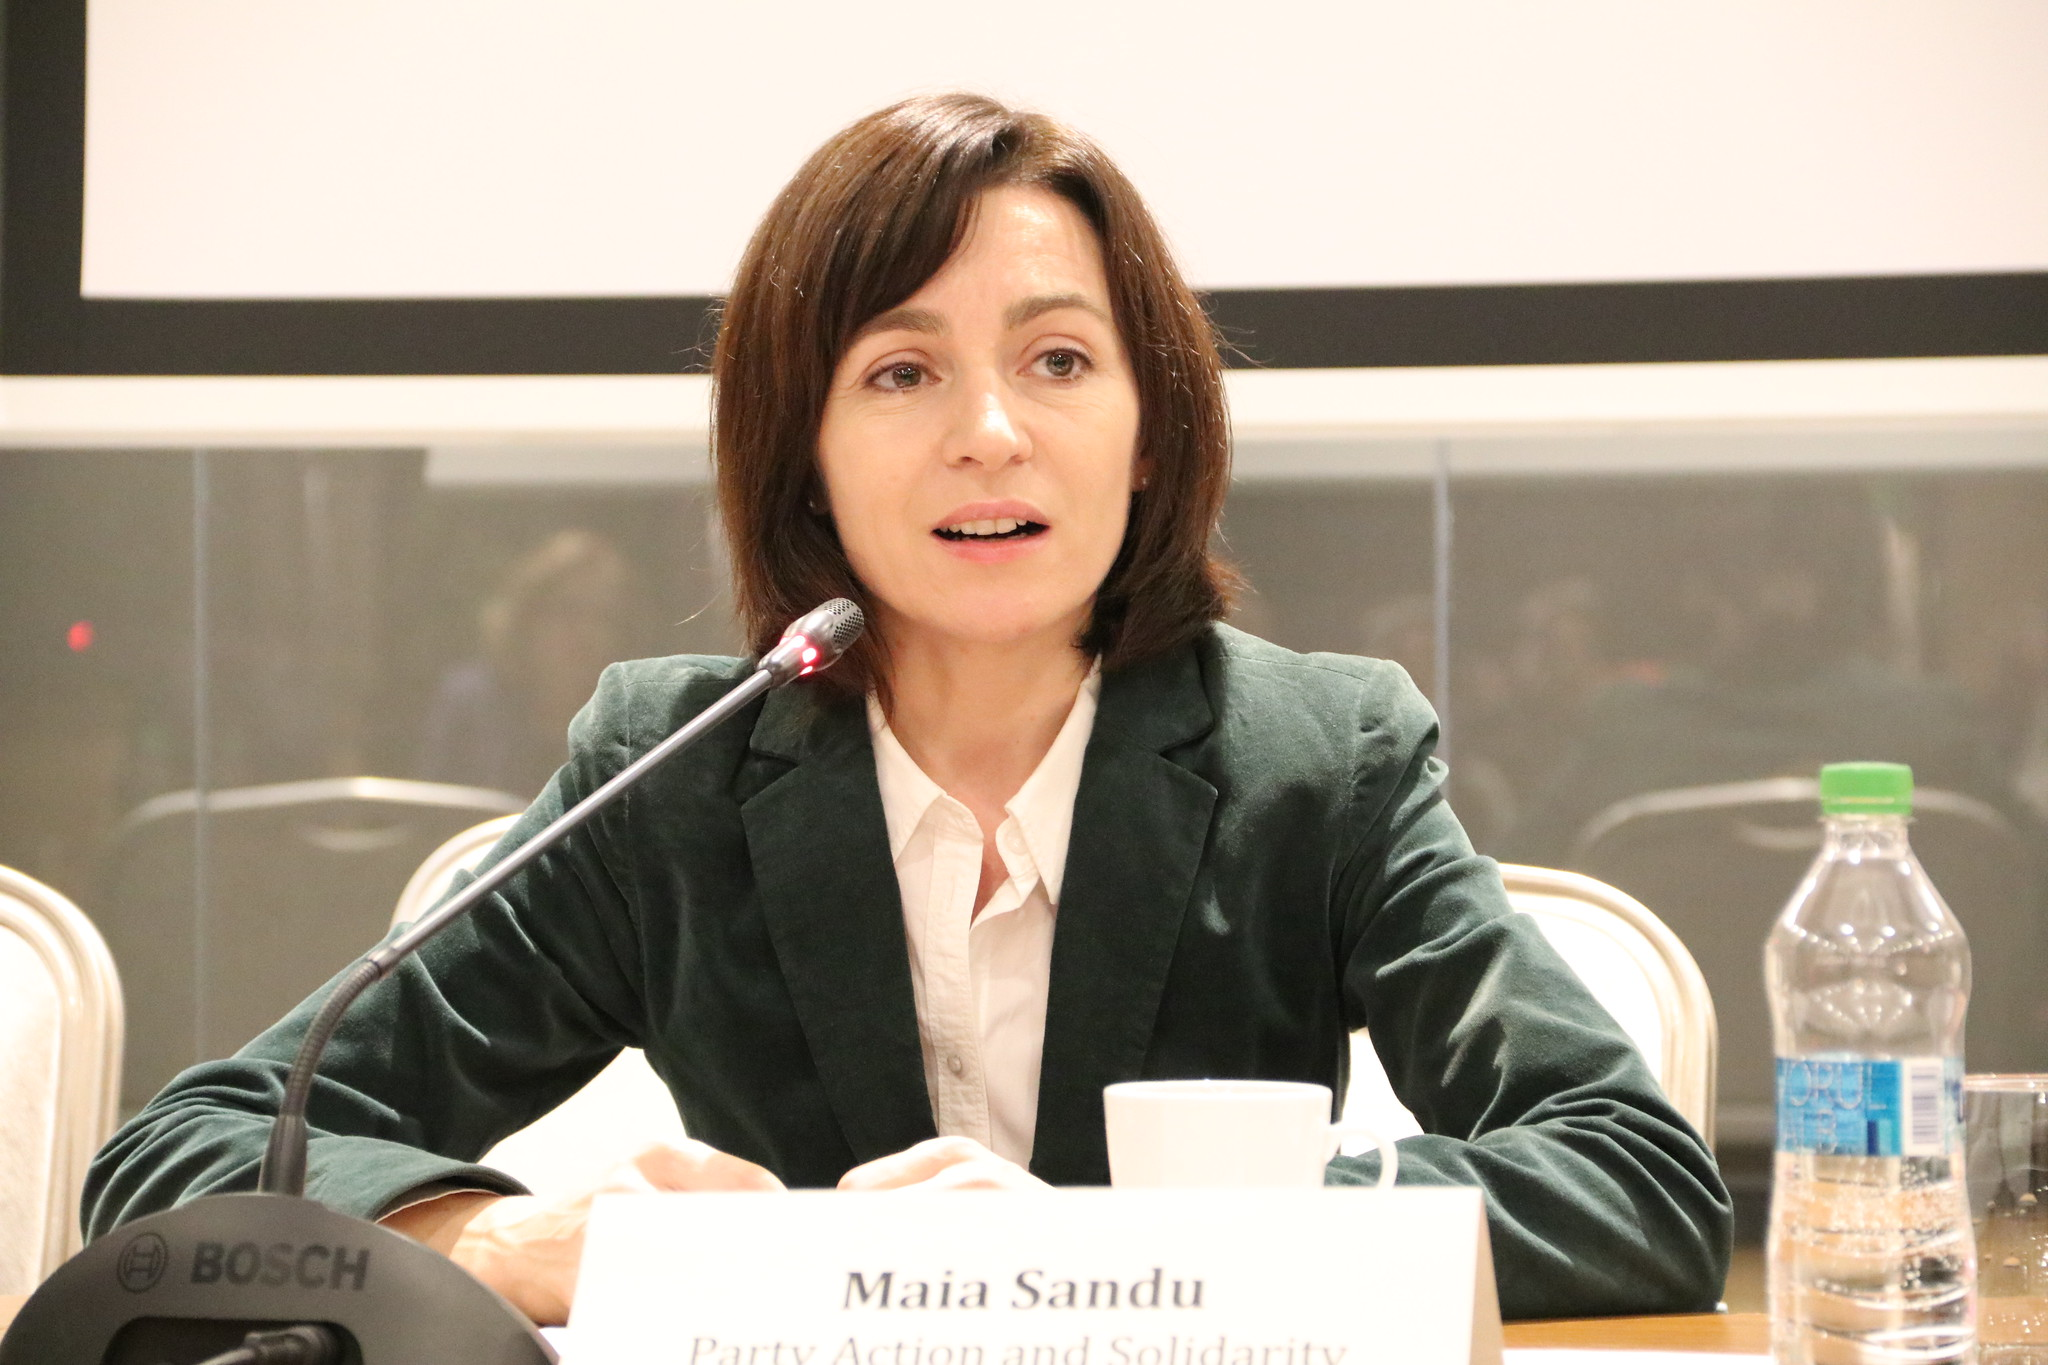 Moldova Election: Sandu Smashes Russia's Candidate